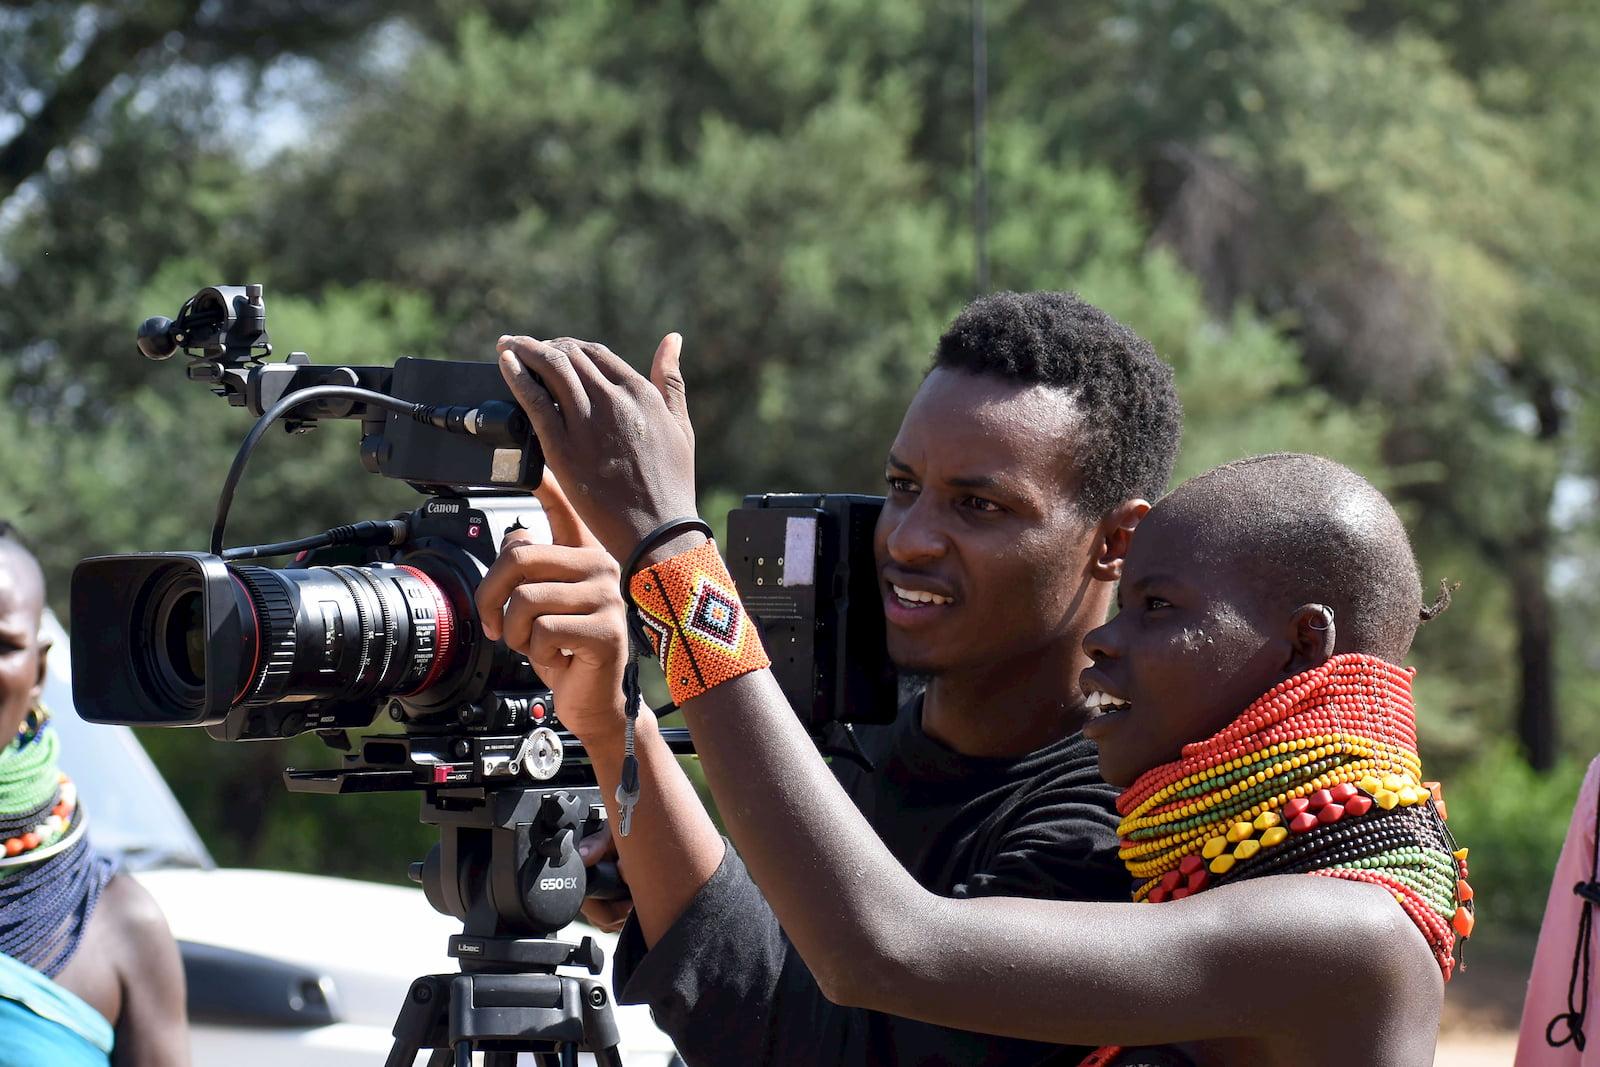 https://mediafocusonafrica.org/wp-content/uploads/2021/08/CMF-Grantee-Friends-of-Lake-Turkana-FoLT-Kenya-1.jpg